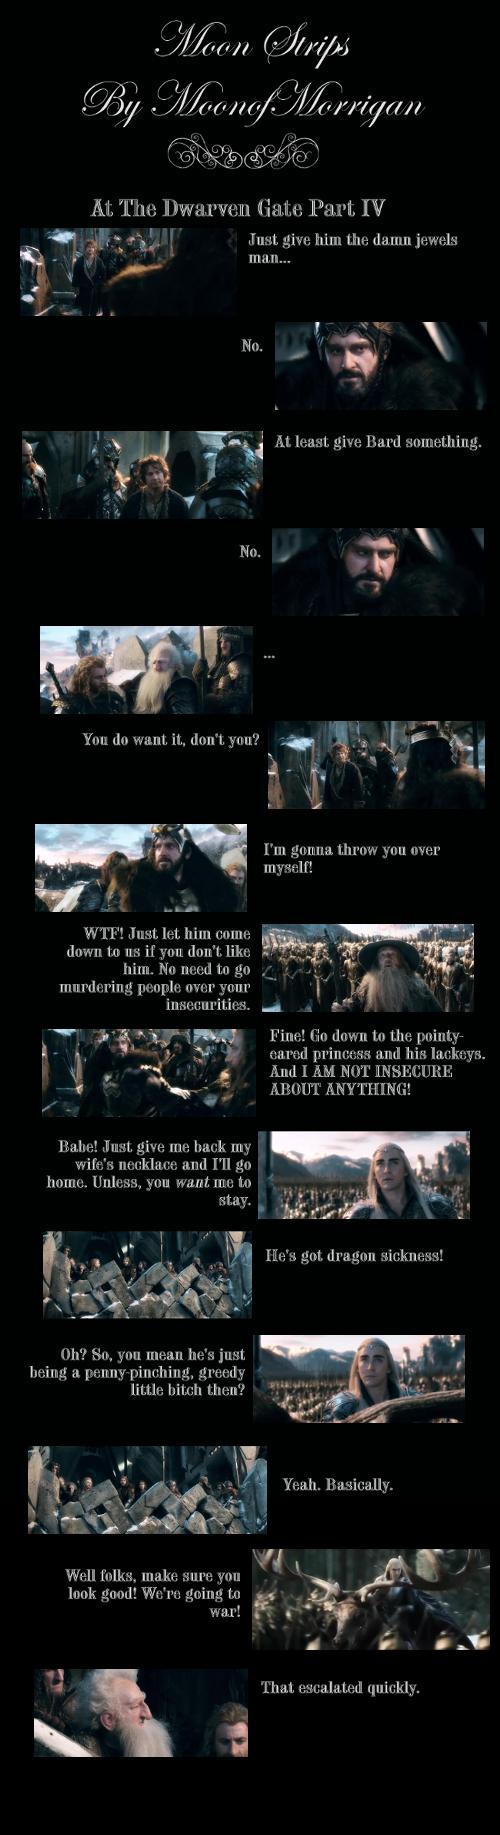 """At the Dwarven Gate 4"" #moonstrips #thorin #thranduil #thehobbit #bilbo #gandalf"